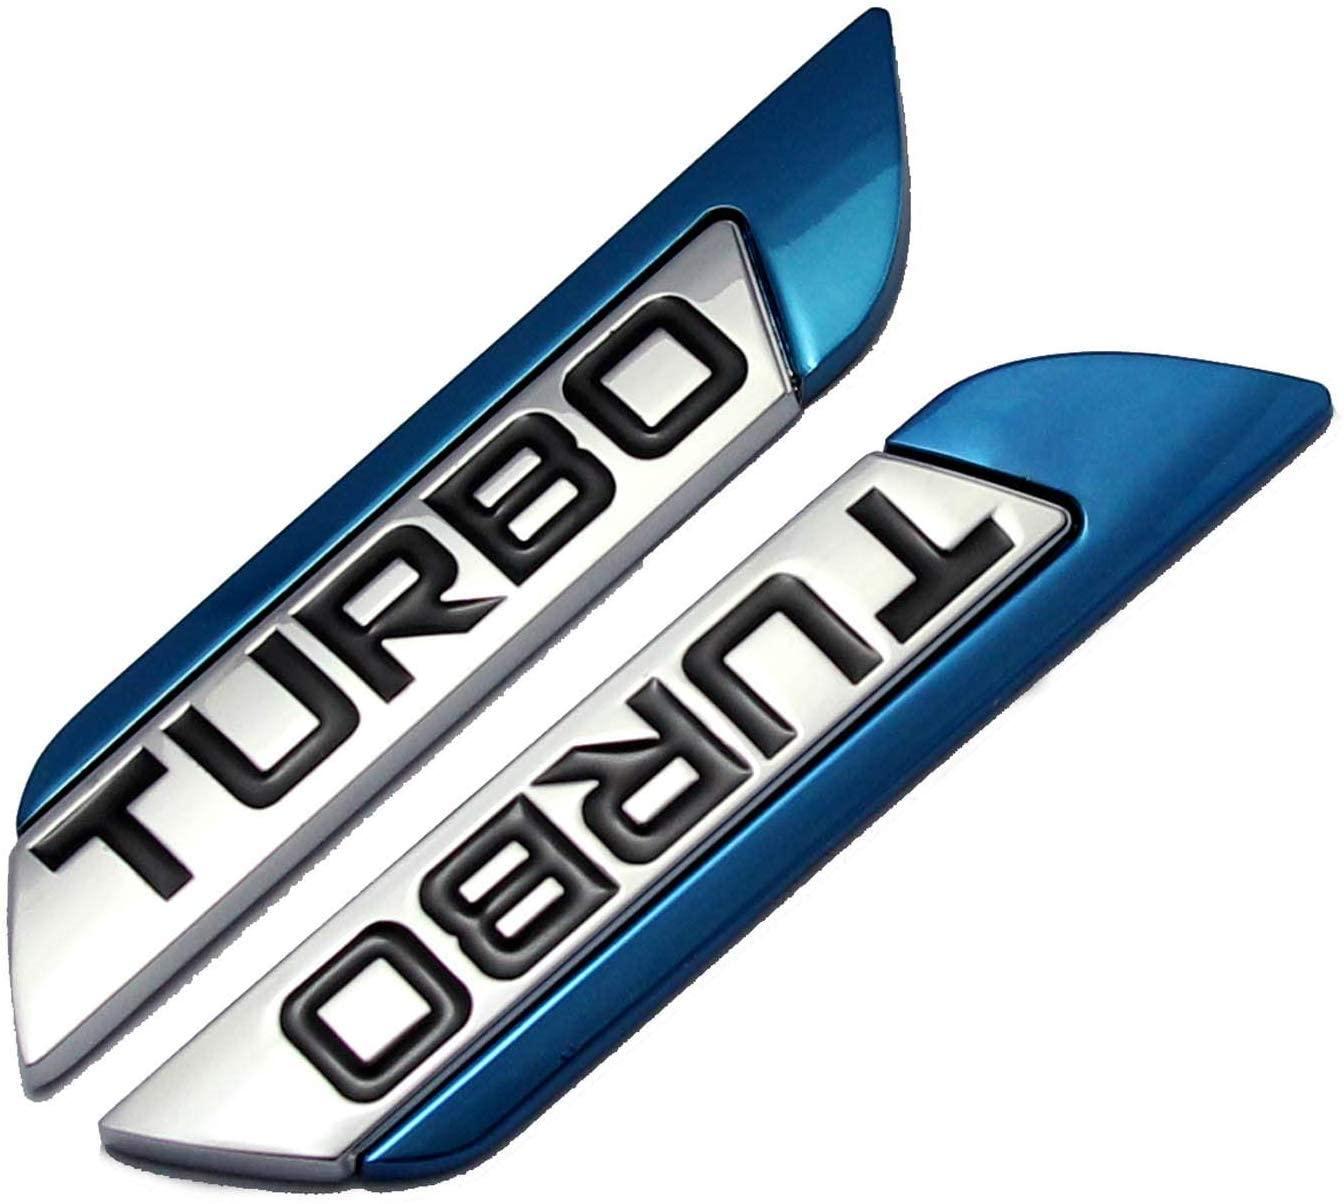 2Pcs/Pair 3D Metal TURBO Car Side Fender Rear Trunk Emblem Badge Sticker Decals for JEEP Dodge Mercedes BMW Mustang Volvo Chevrolet Nissan Audi VW Ford Honda Toyota Jaguar (blue)